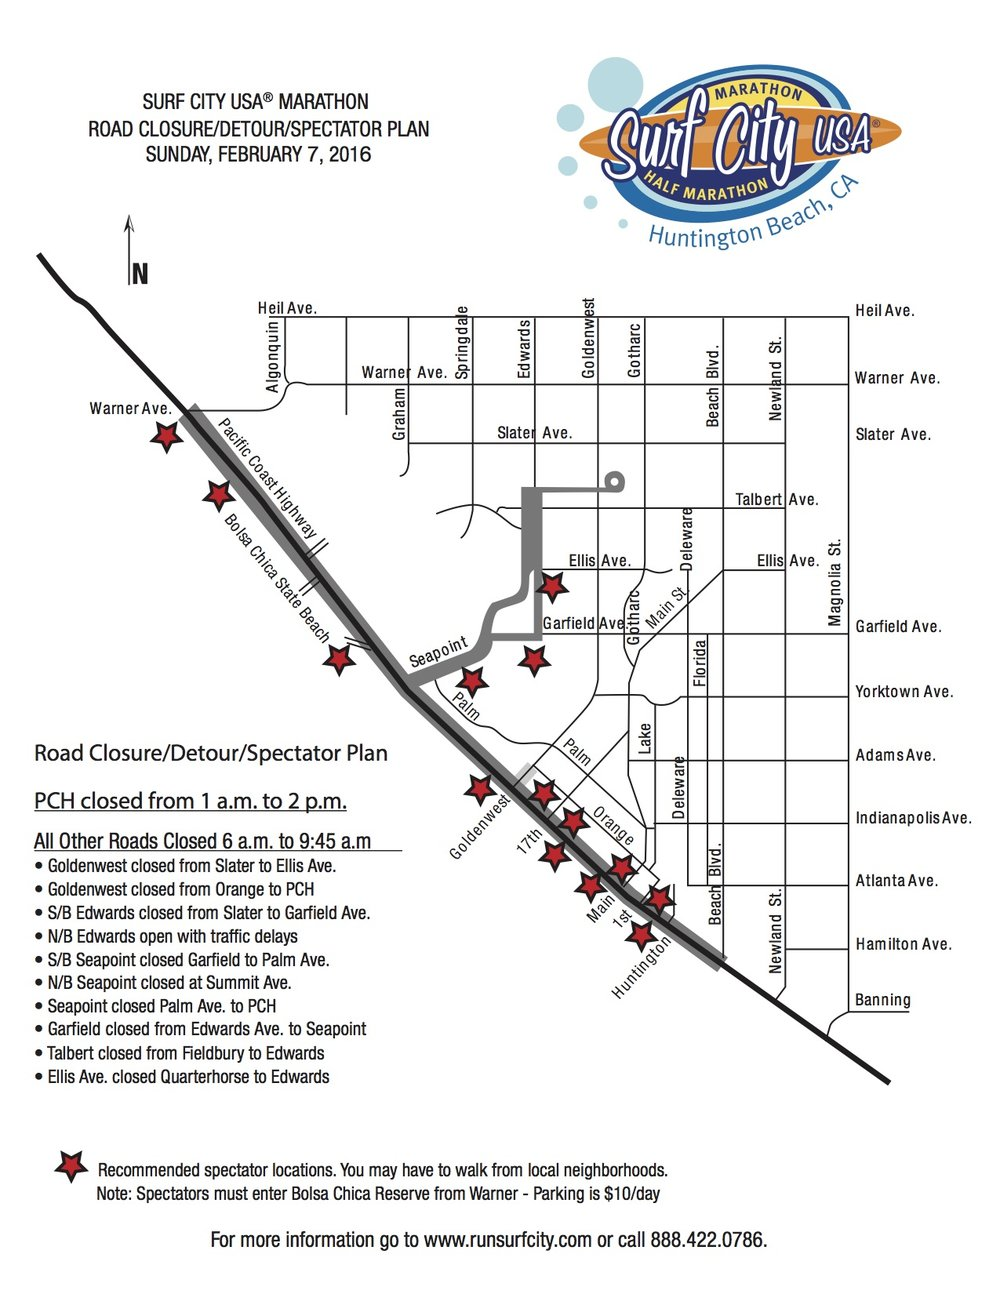 Via  Surf City USA Marathon